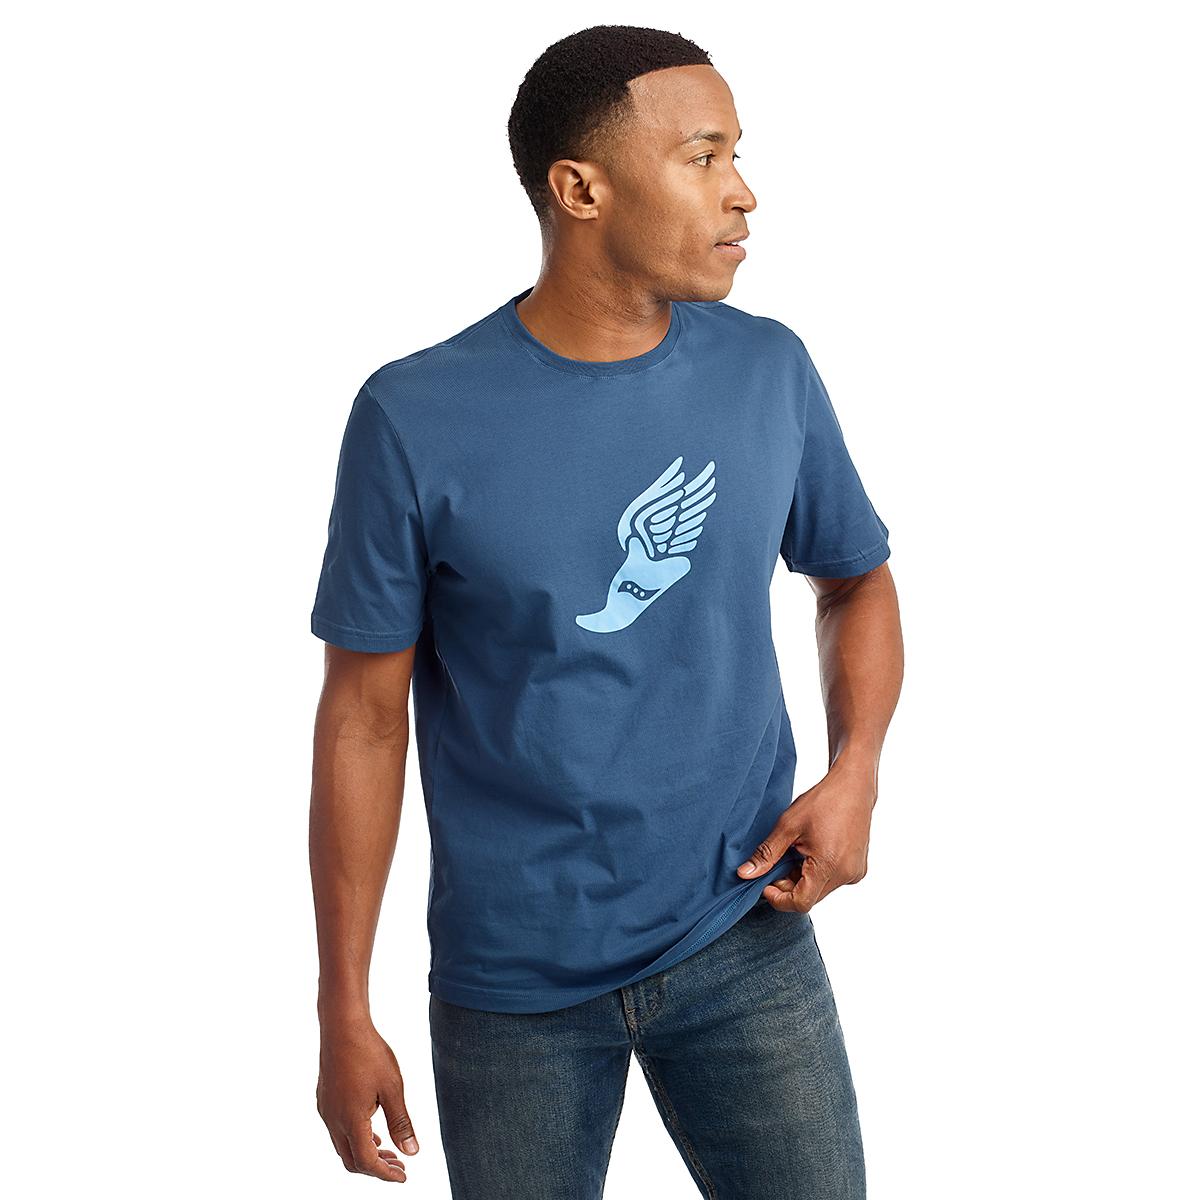 Men's Saucony Rested Short Sleeve Tee - Color: Ensign Blue - Size: S, Ensign Blue, large, image 1